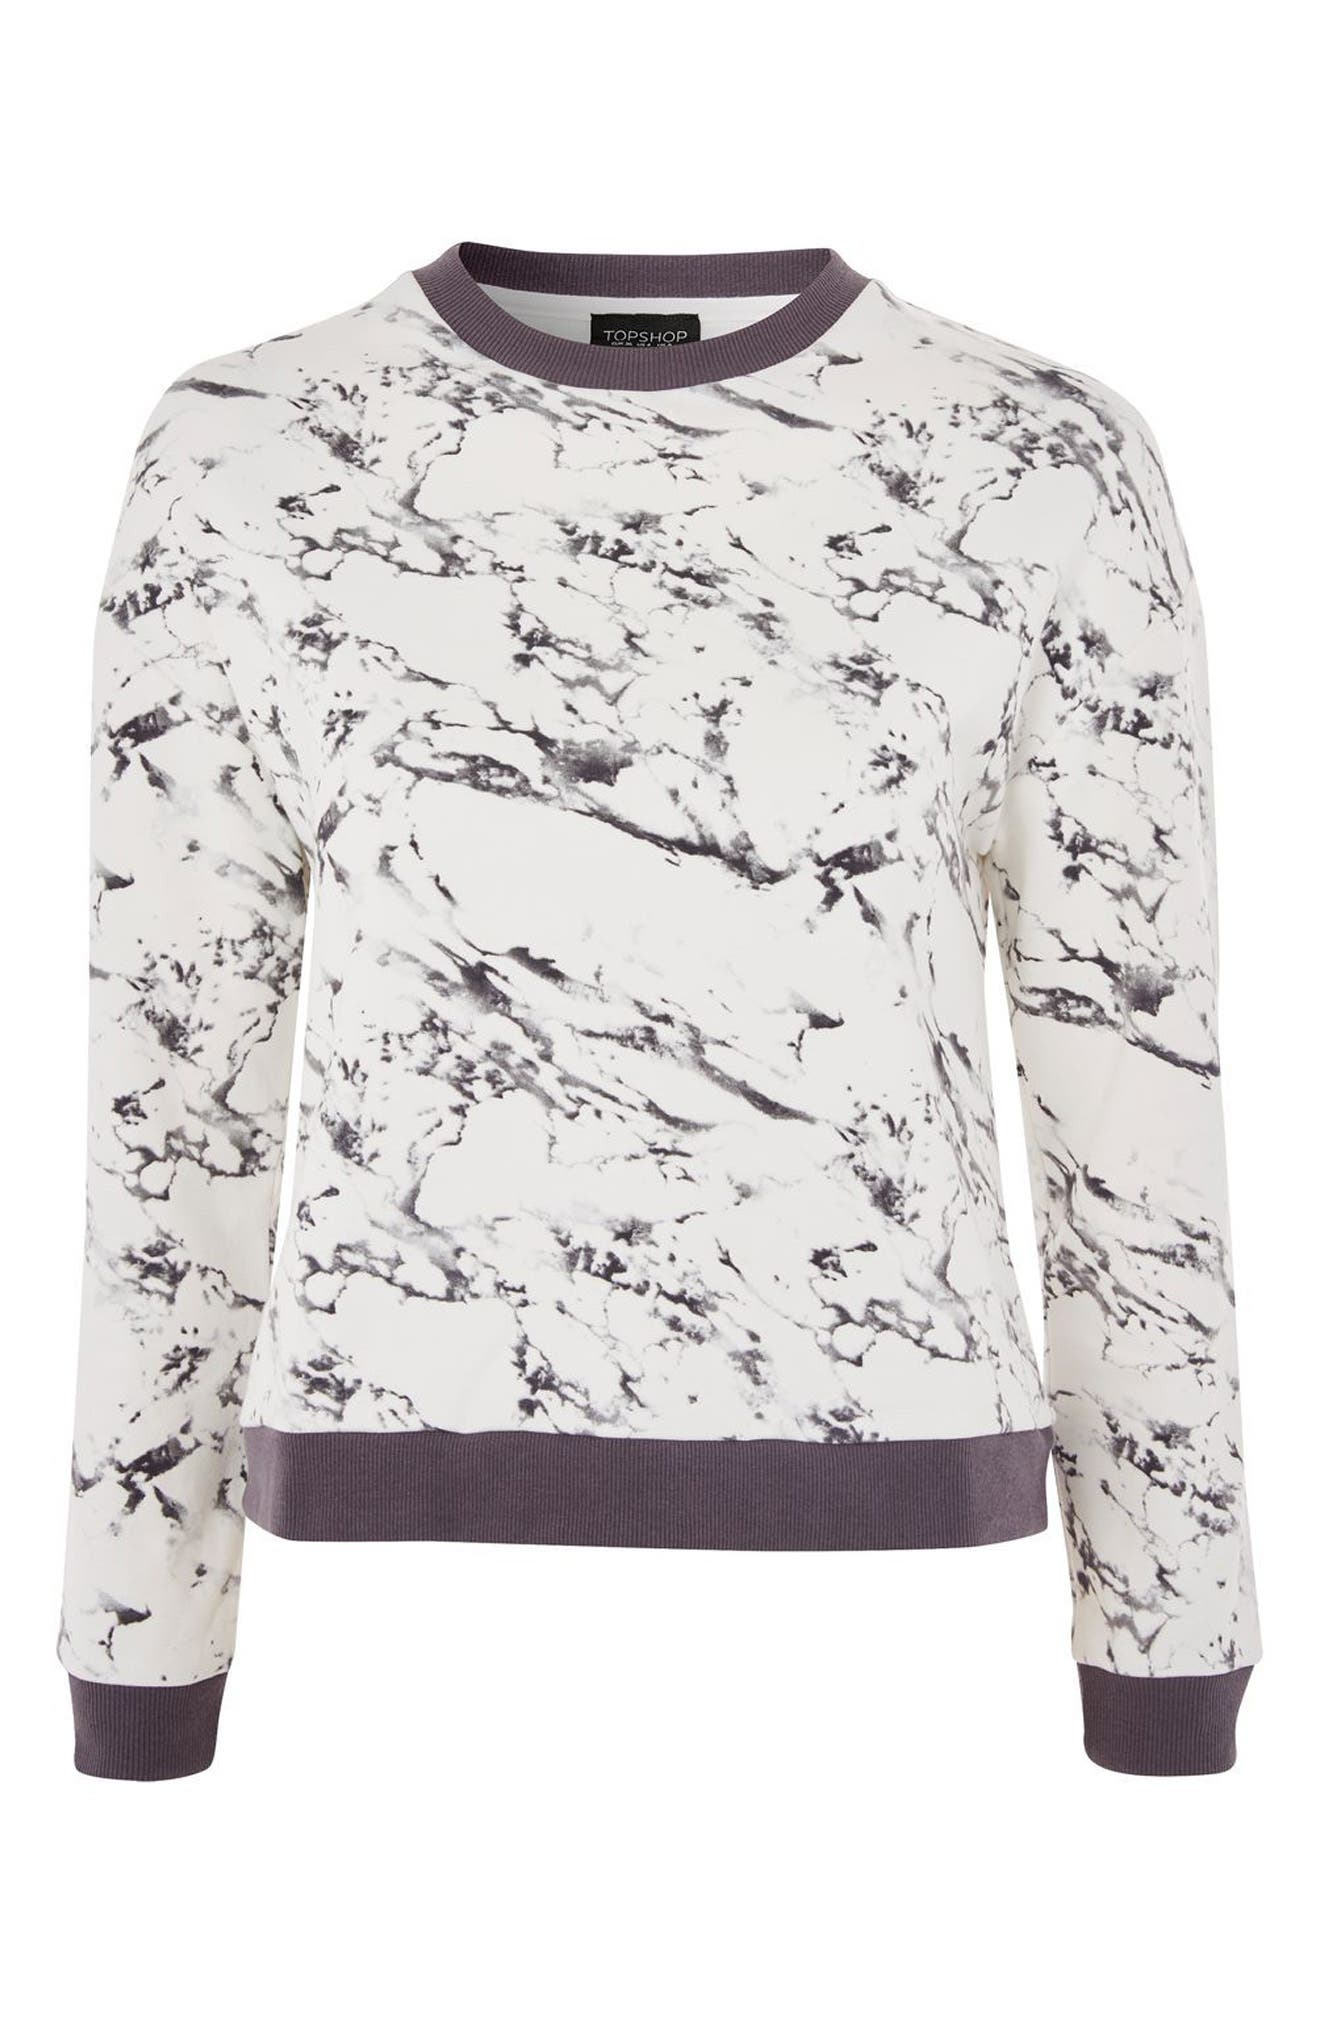 Alternate Image 2  - Topshop Marble Print Lounge Sweatshirt